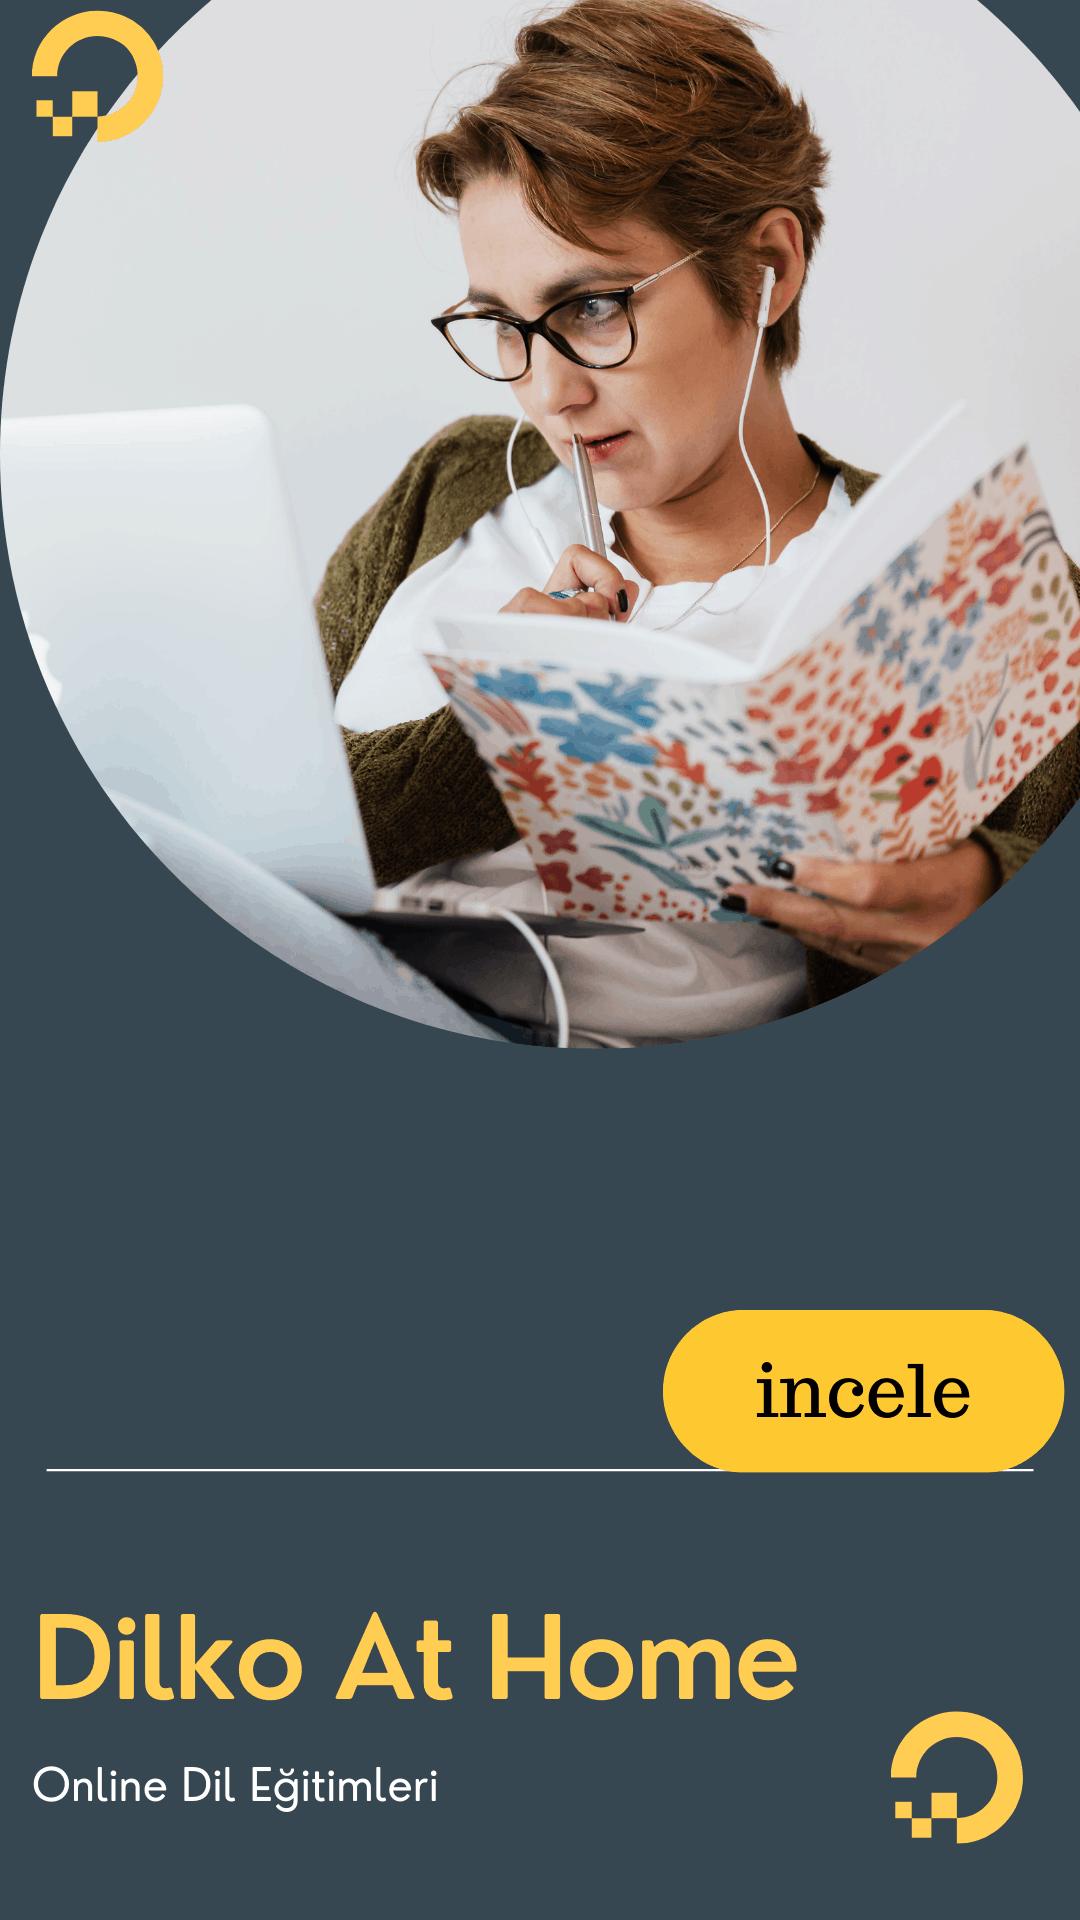 online ingilizce kursu dikey